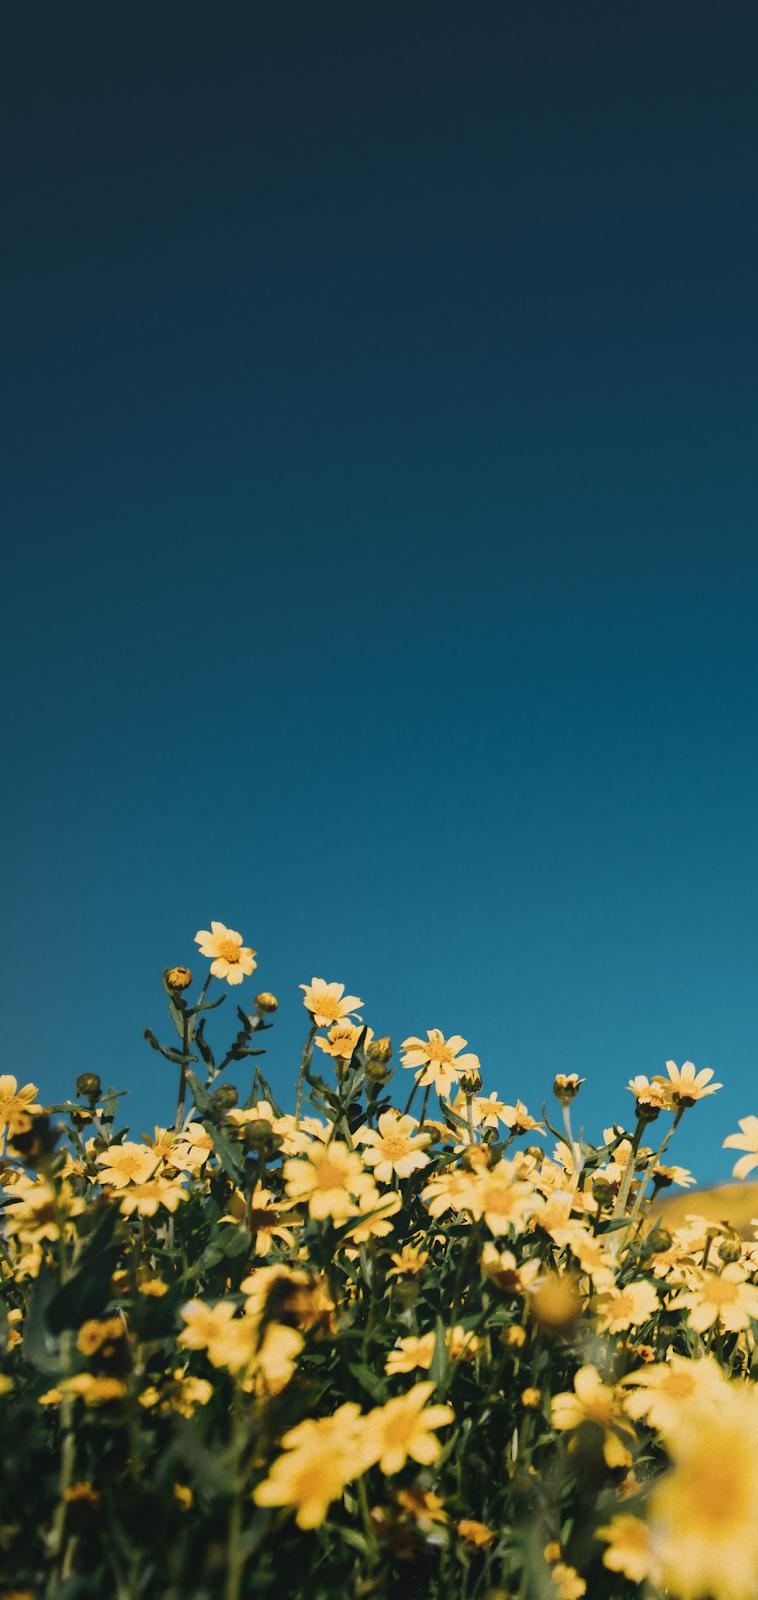 Yellow Flowers In The Blue Sky In 2020 Blue Sky Wallpaper Yellow Flowers Blue Flower Wallpaper